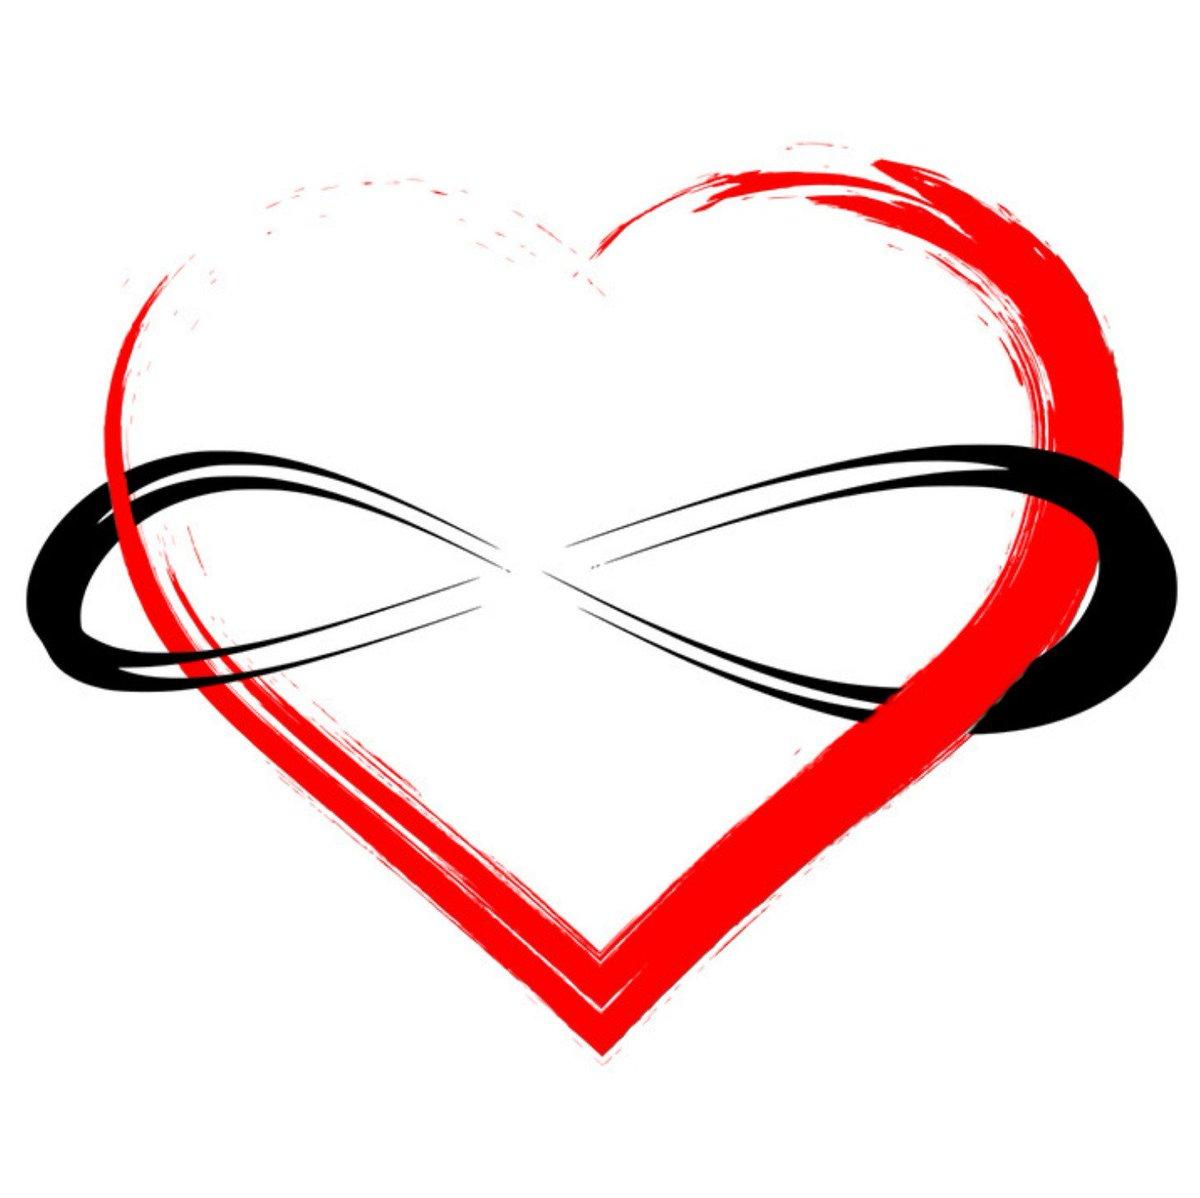 символы любви в виде картинки пуля